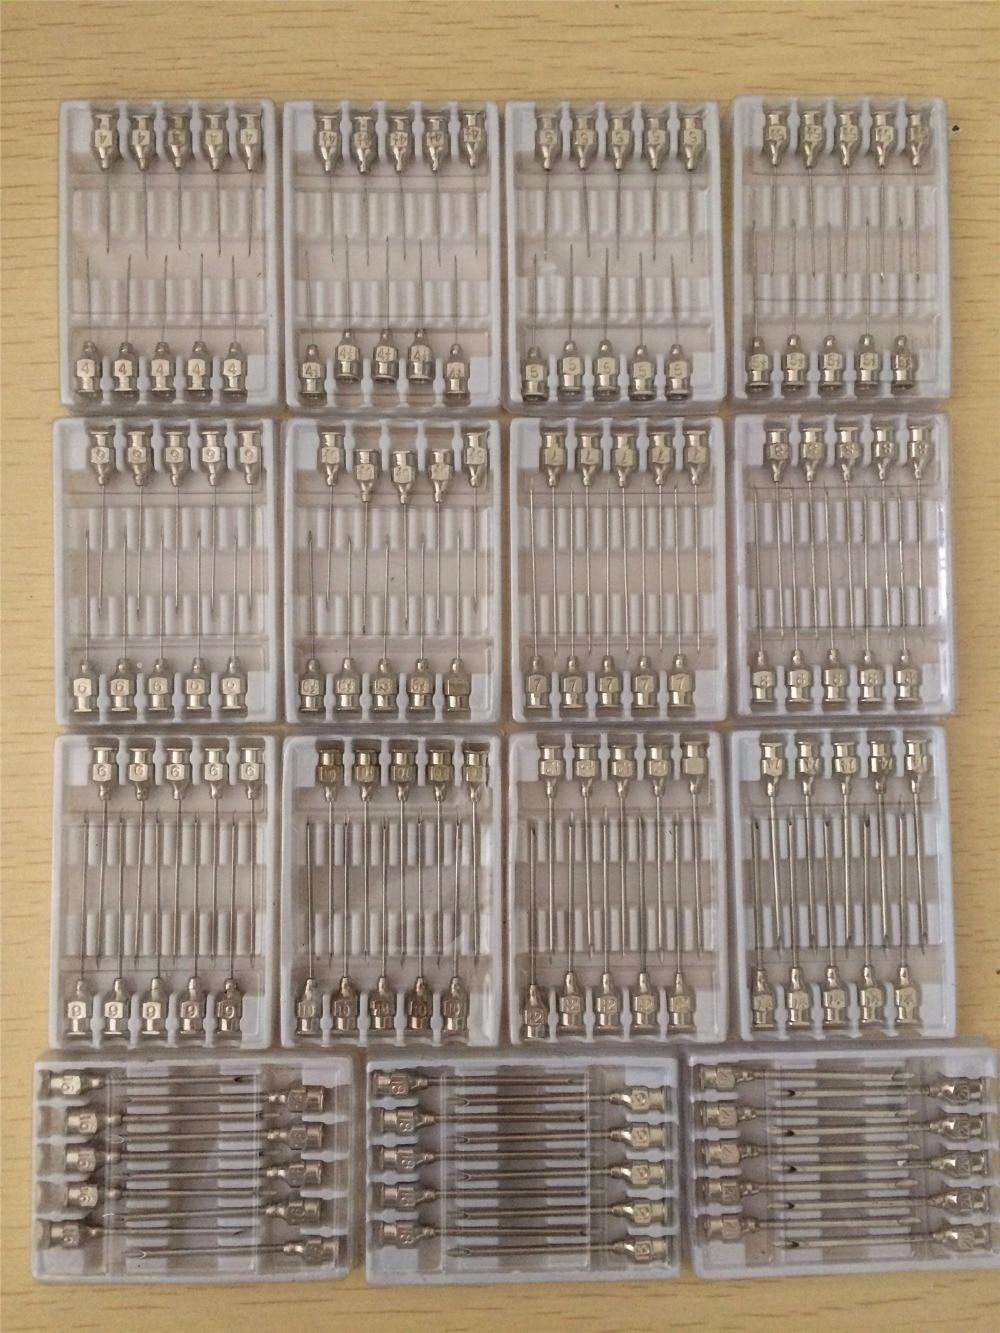 10pcs #4 #4.5 #5 #5.5 #6 To #20 Stainless Steel Syringe Needle Dispensing Needles 11 11 free shippinng 6 x stainless steel 0 63mm od 22ga glue liquid dispenser needles tips